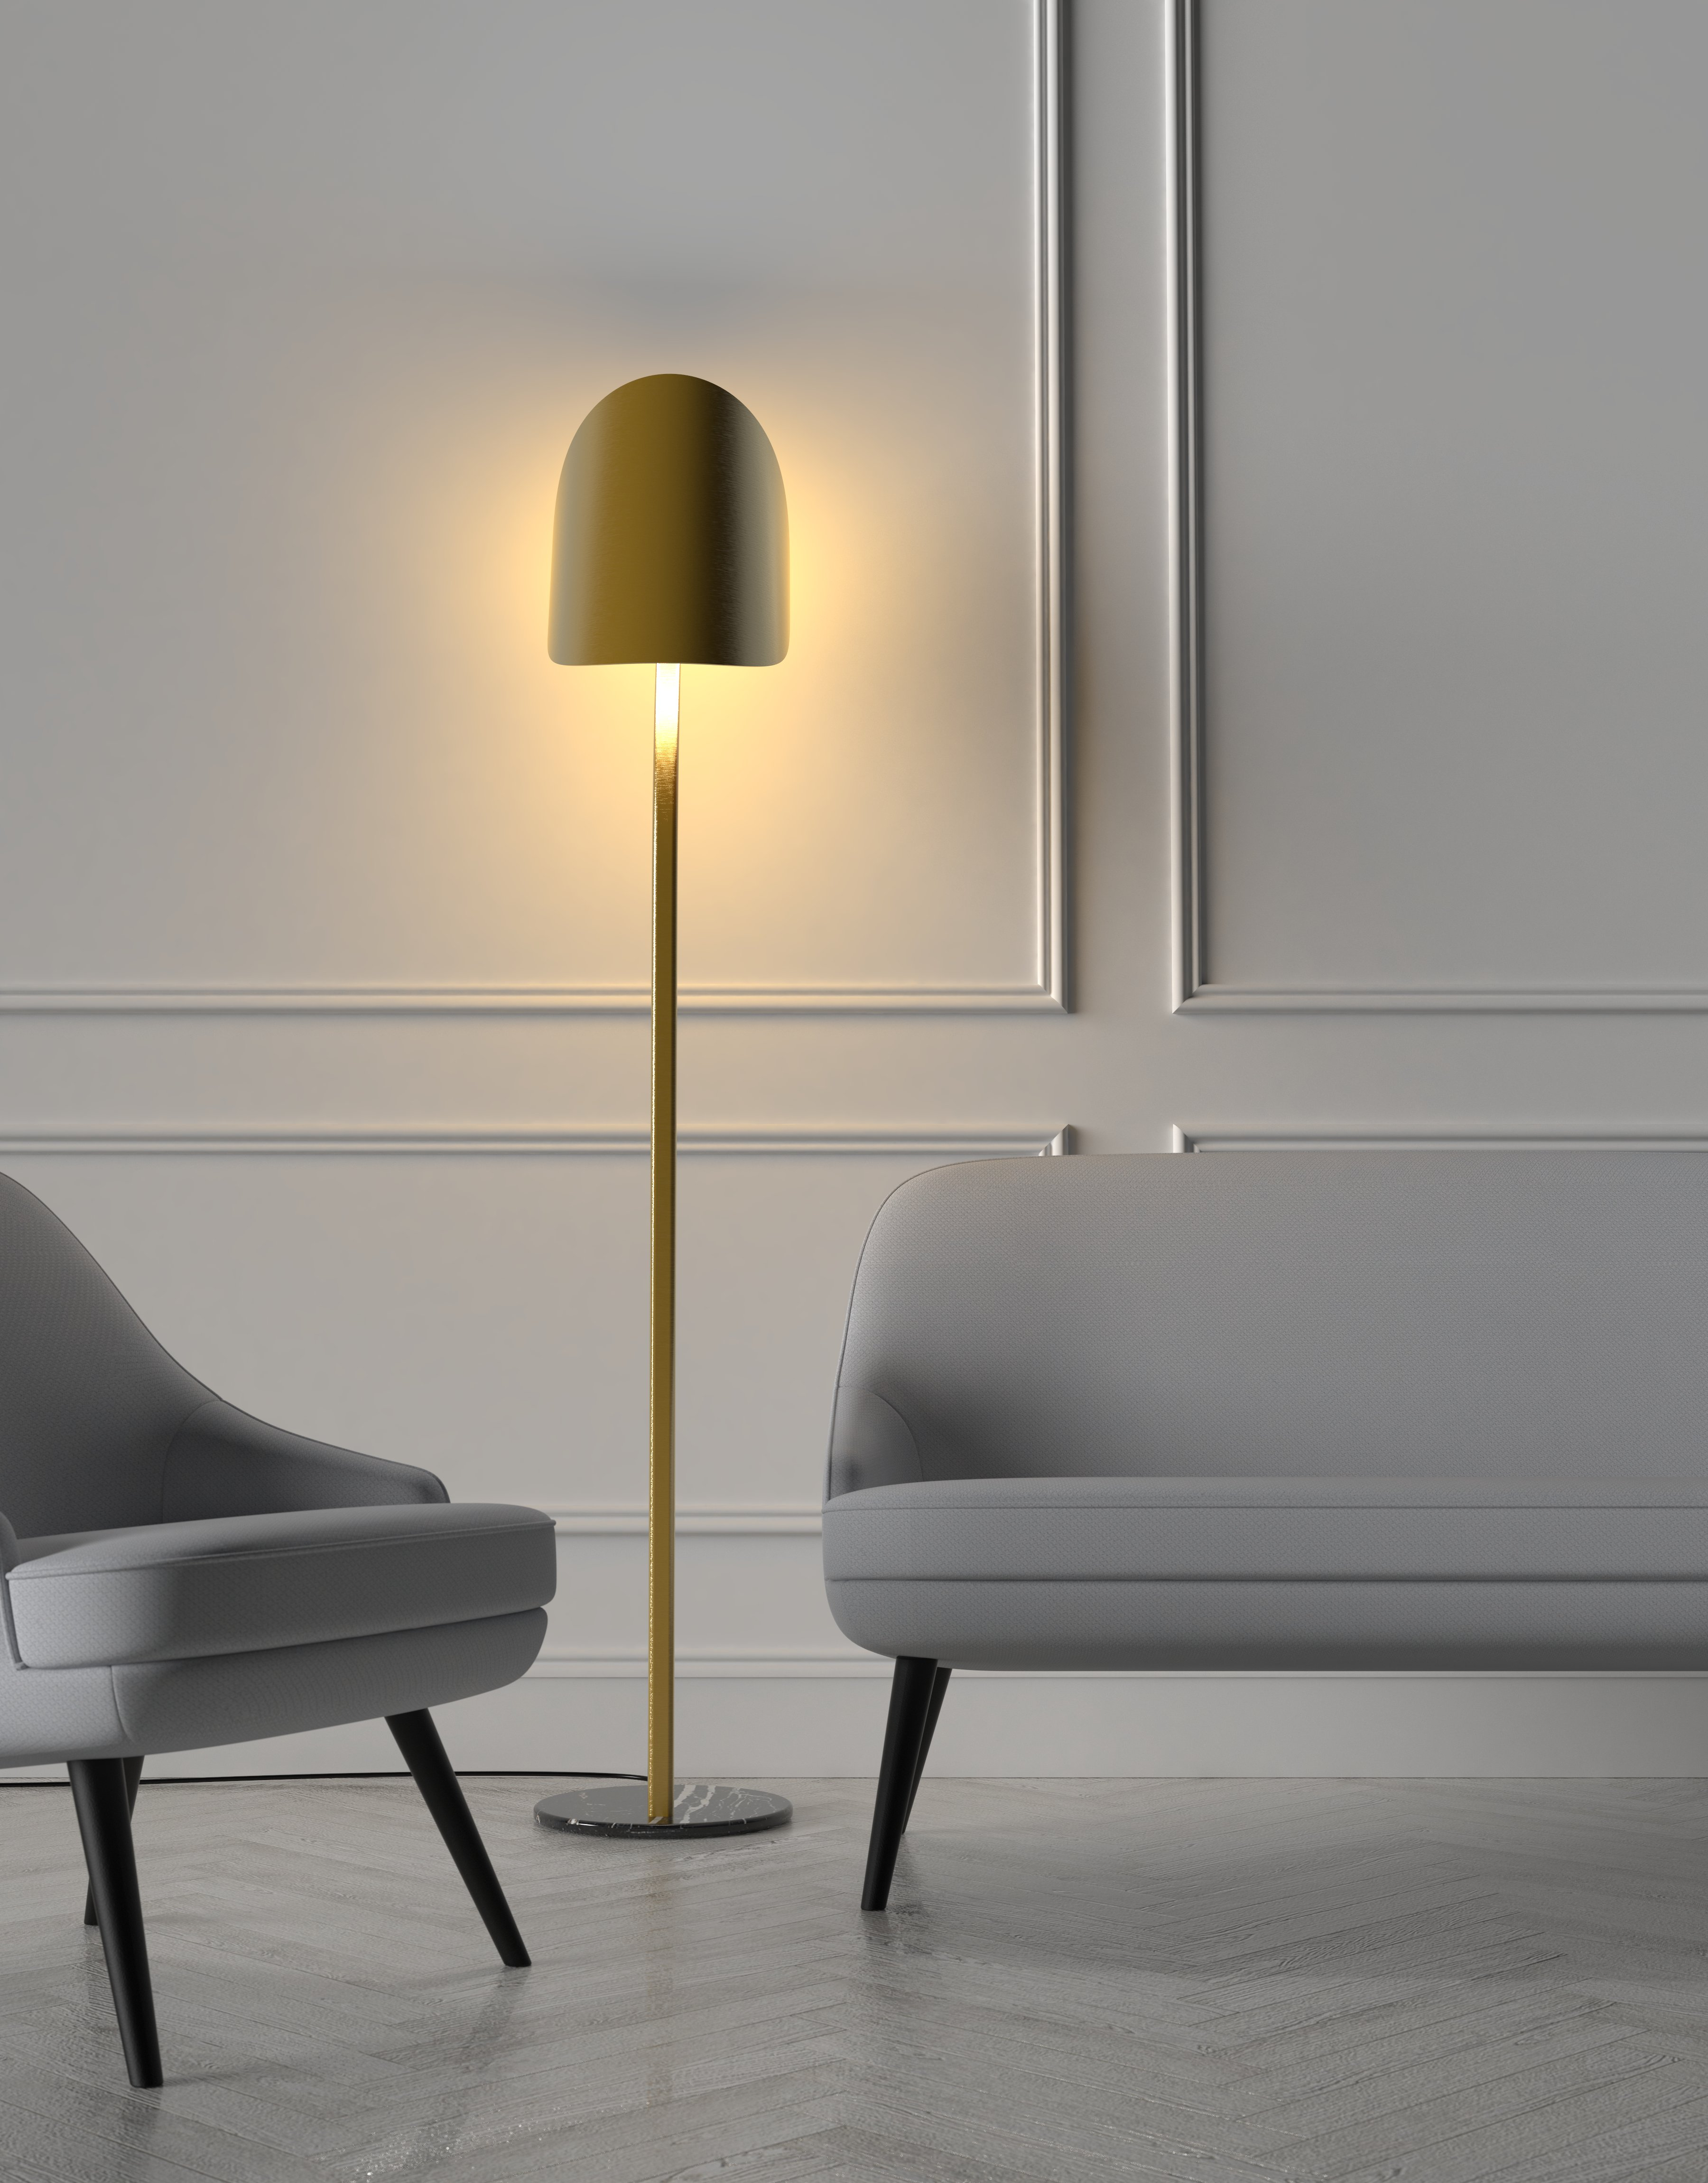 lampara pie laton deco dorada diseño